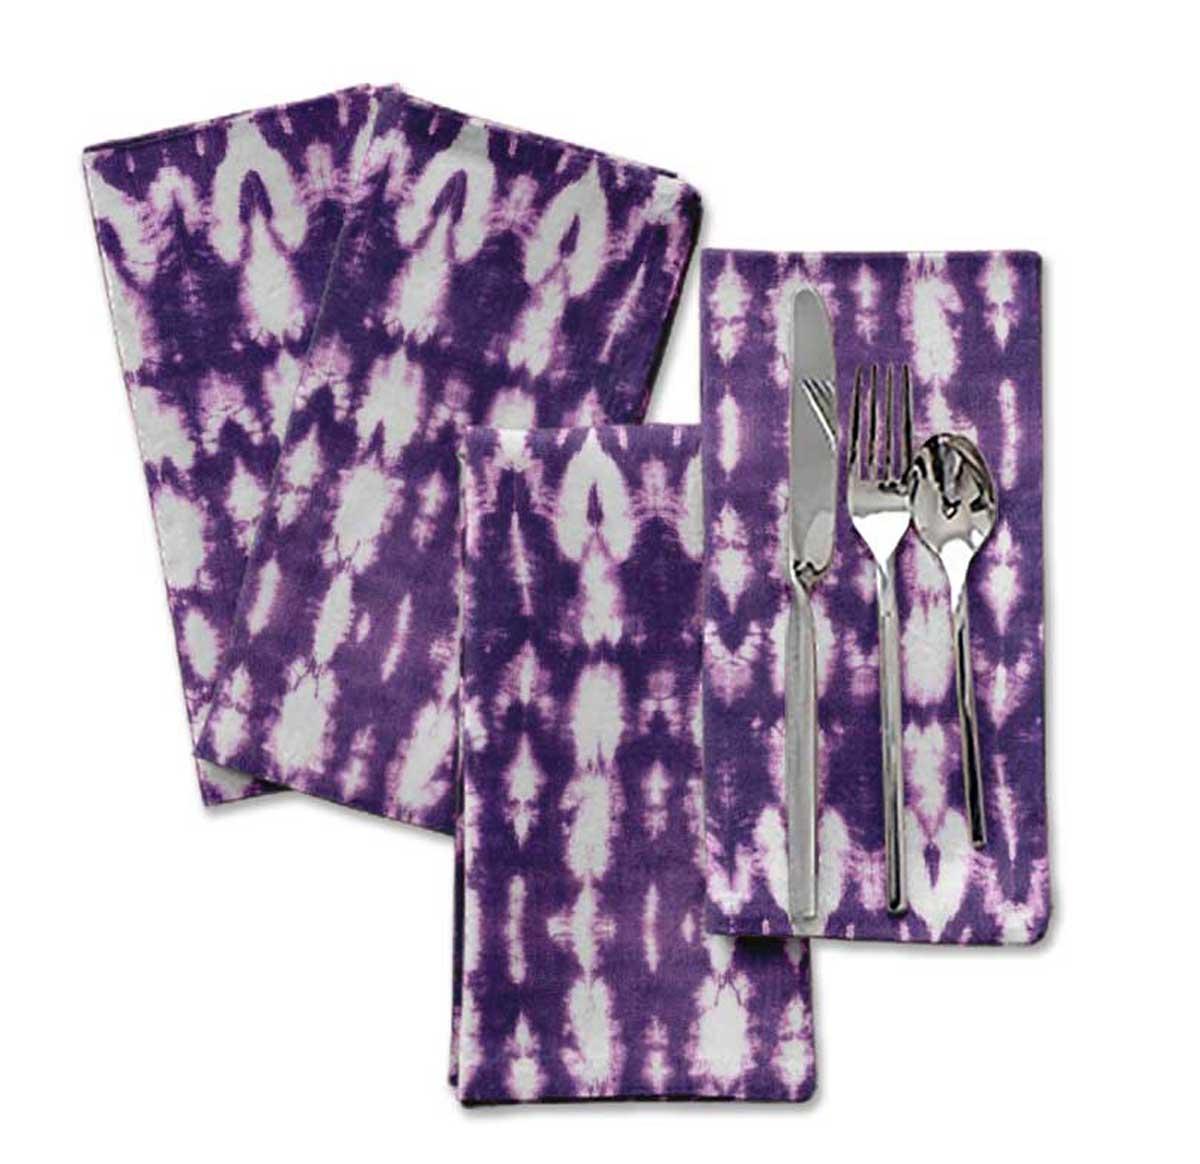 100/% Cotton Blue Shibori Dinner Table Linen Re-Usable Printed Decor Napkins Set 20 x 20 Pack of 6